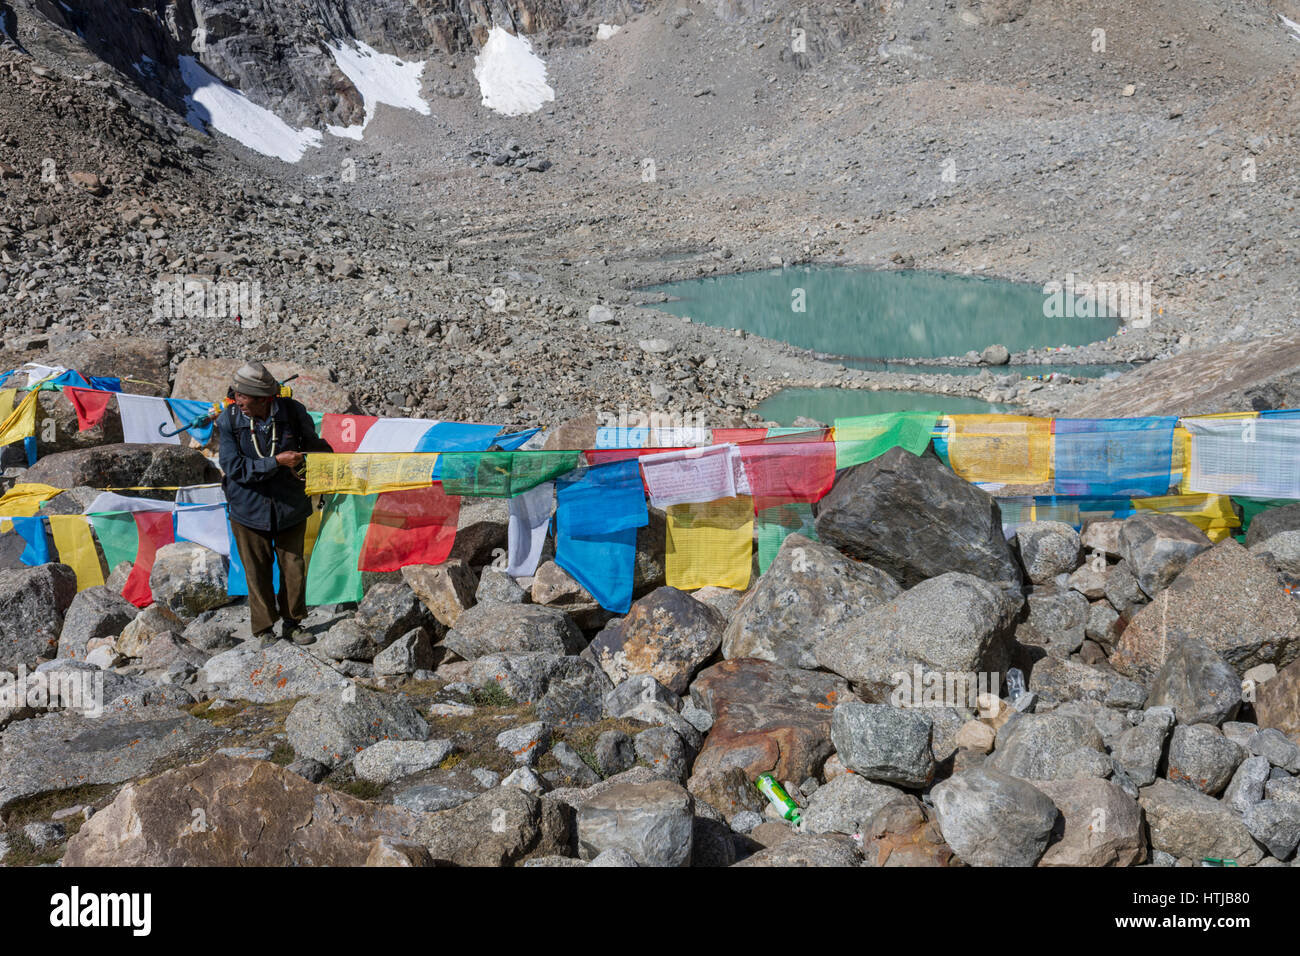 Tibetan Buddhist man pilgrim tying the Lung ta prayer flags at Dolma La pass en route Mt. Kailash Kora - Stock Image